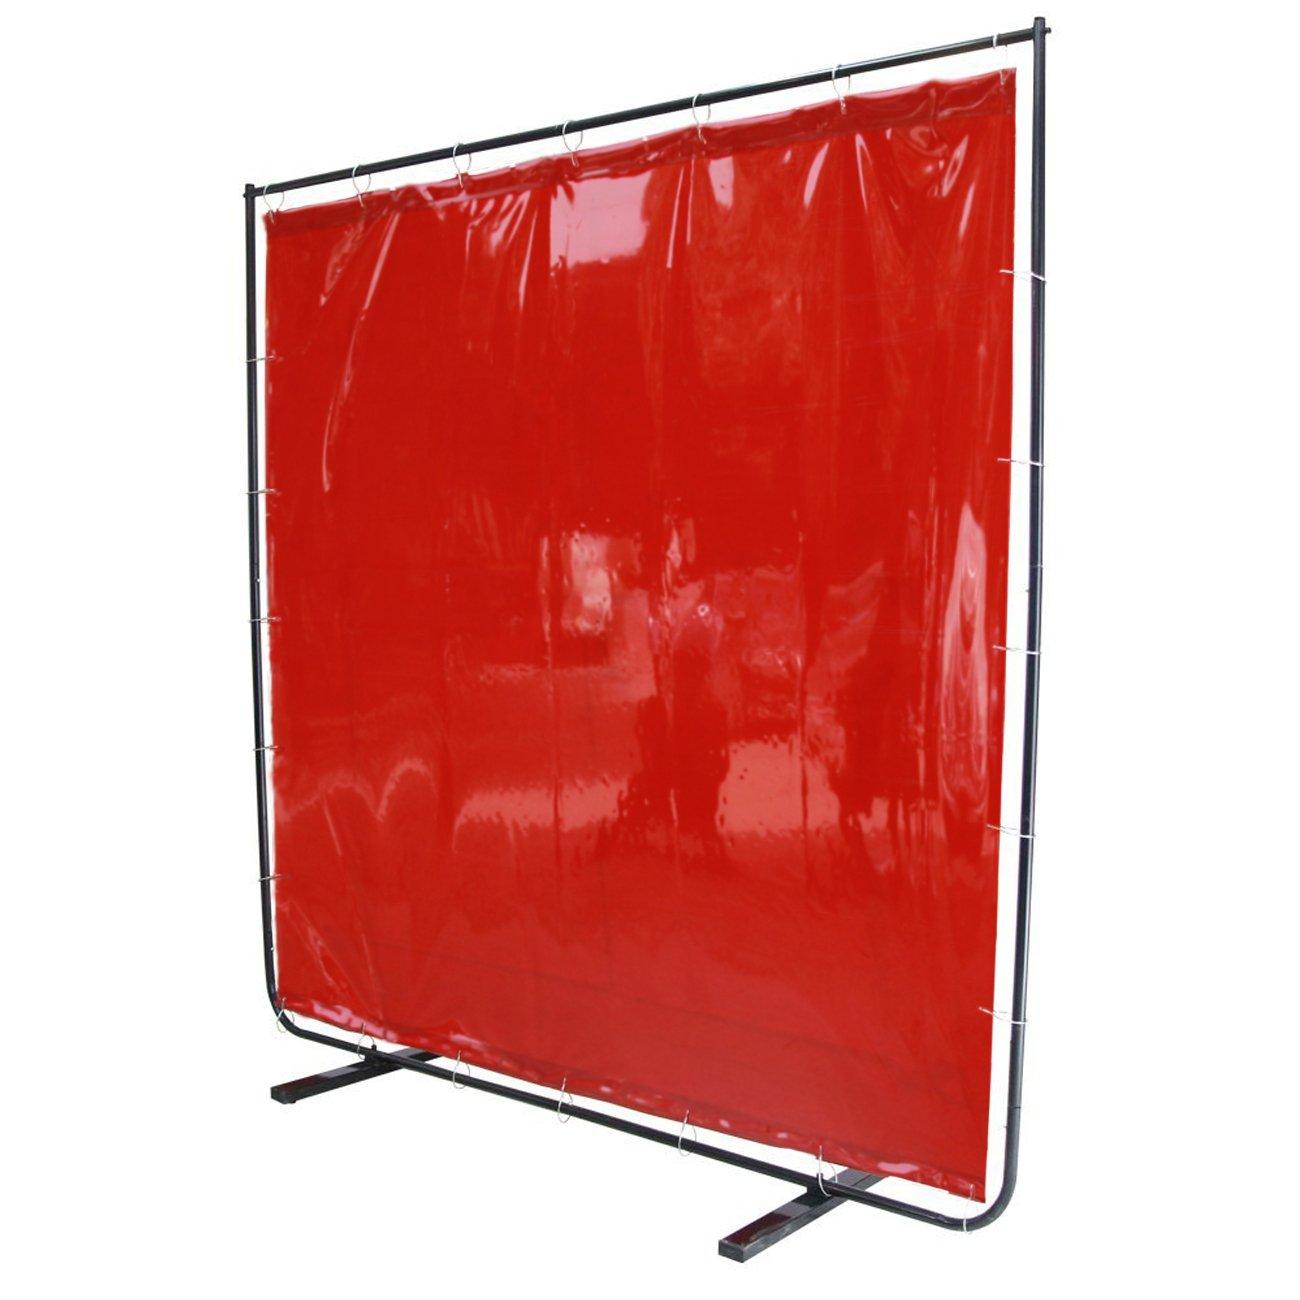 VIZ-PRO Red Vinyl Welding Curtain/Welding Screen With Frame, 6' x 6' by VIZ-PRO (Image #1)